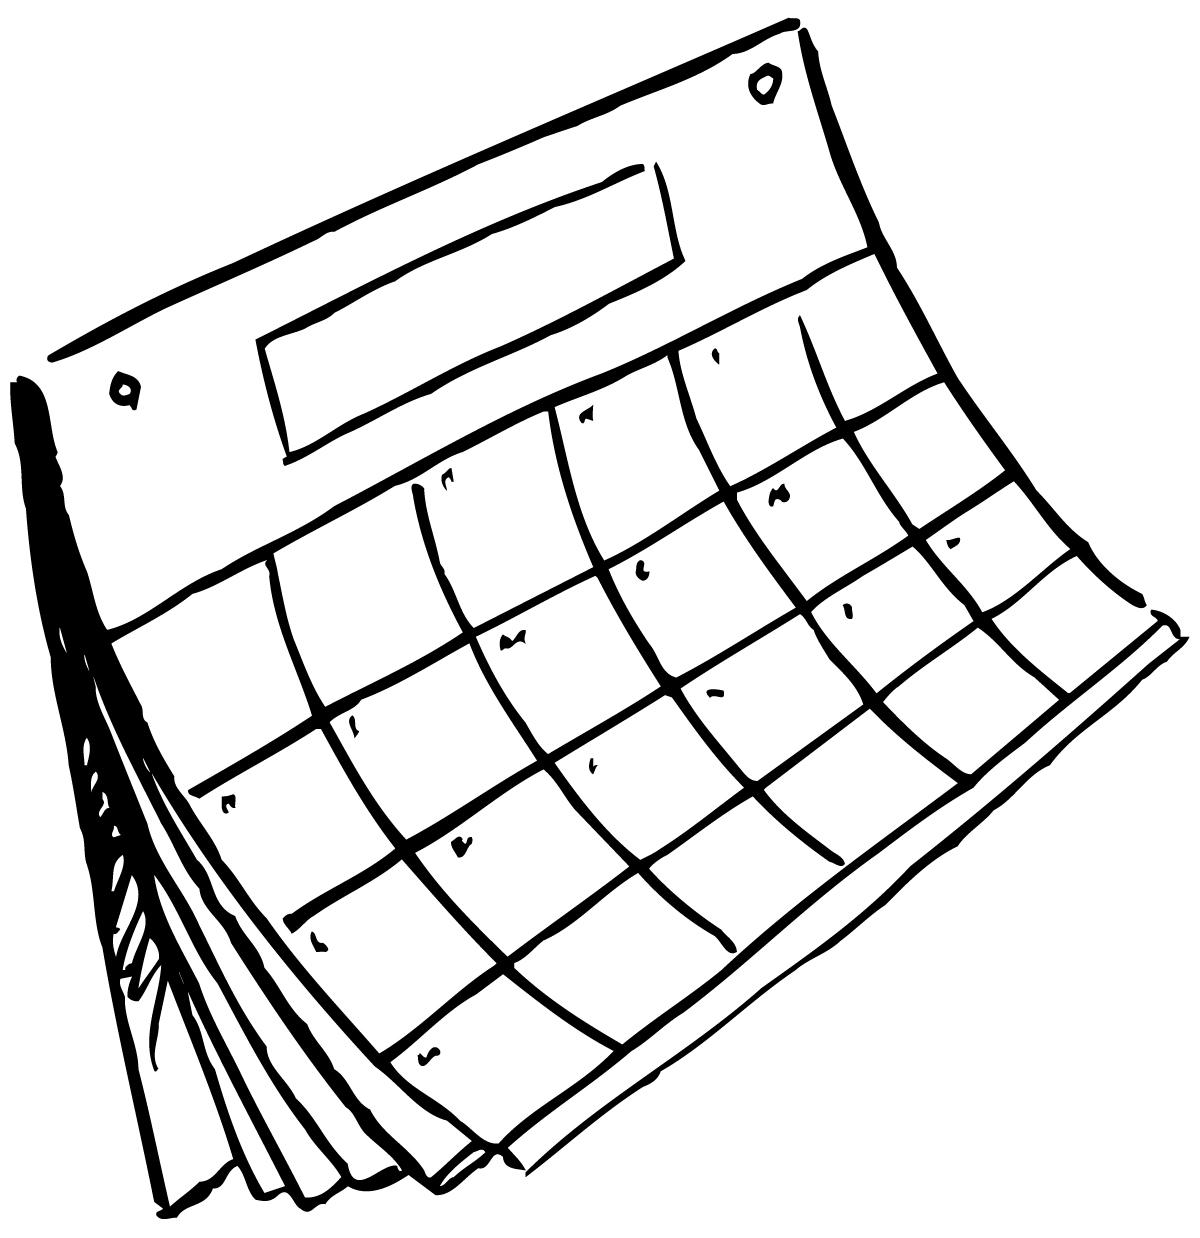 Calendar Drawing at GetDrawings Free for personal